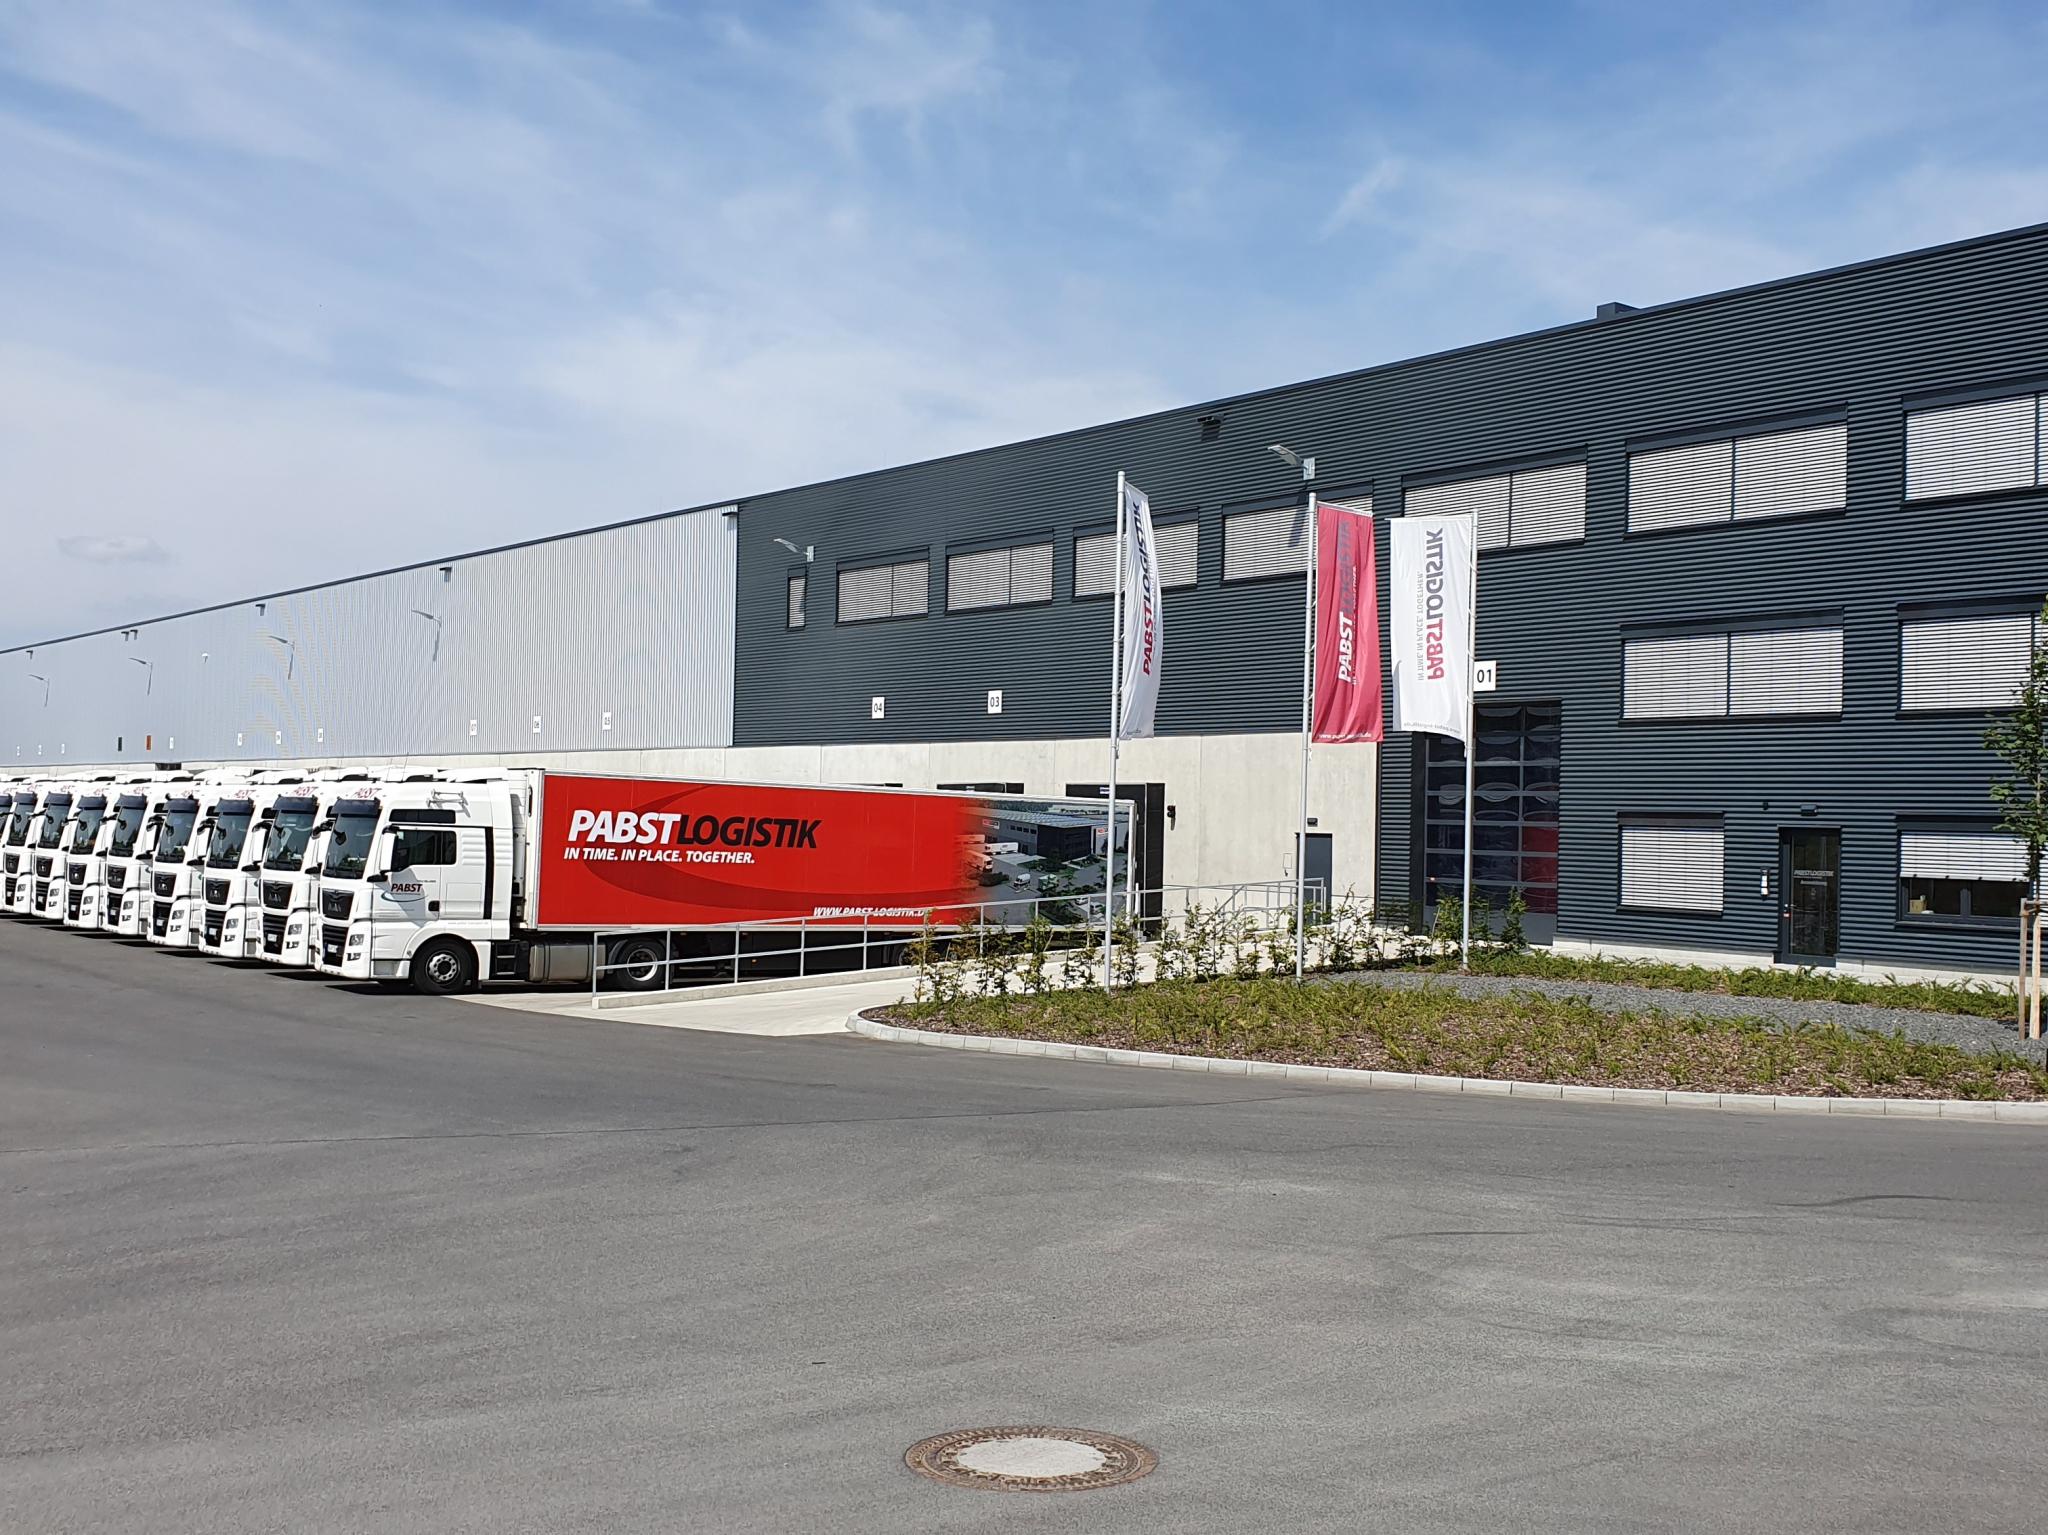 Pabst_Transport_Logistikcenter